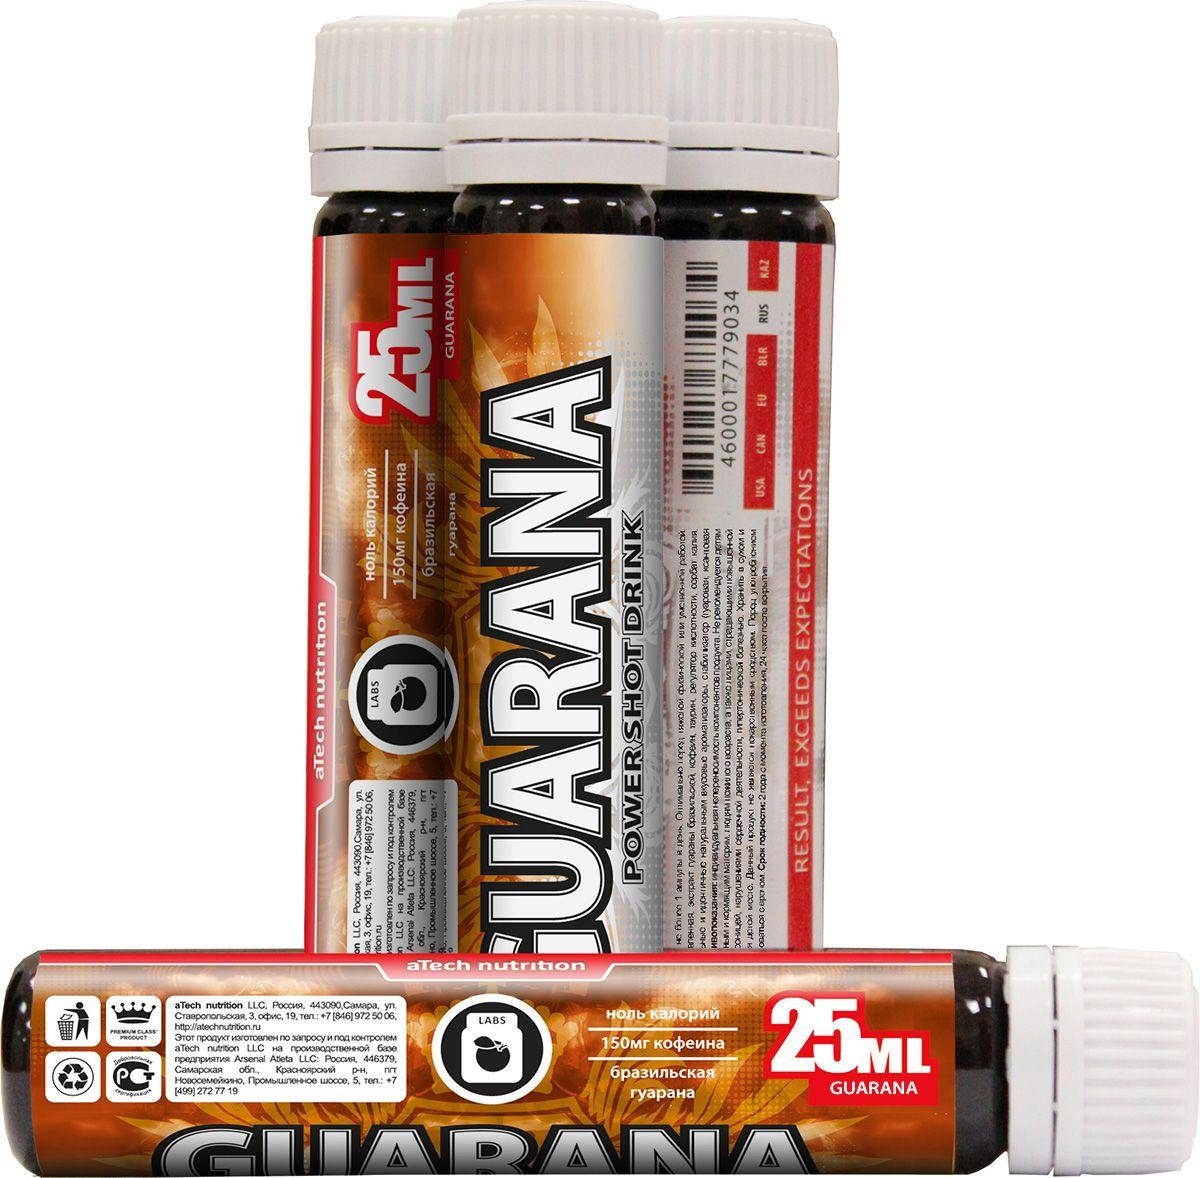 "Энергетический напиток aTech Nutrition ""Guarana Power Shot Drink"", гуарана, 25 мл"